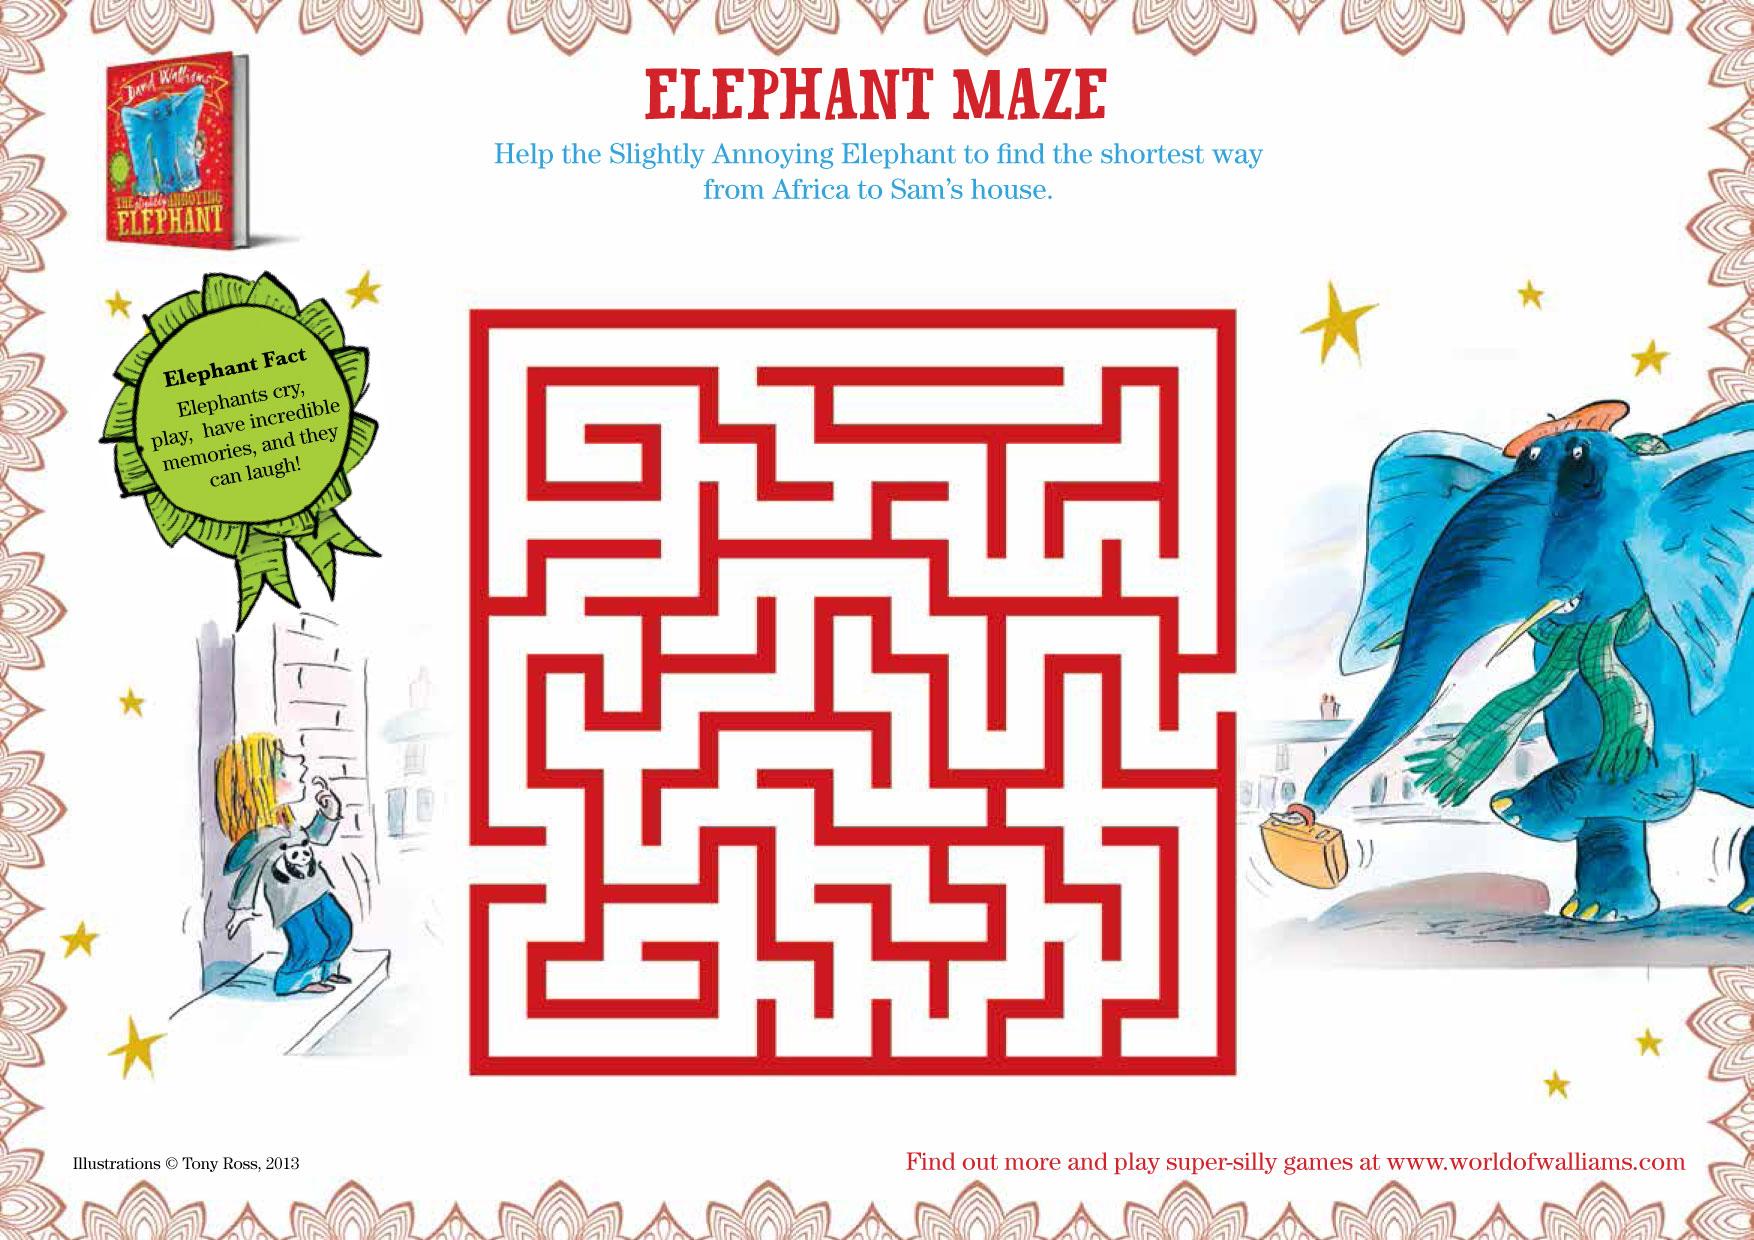 Elephantmaze act puz 1172780